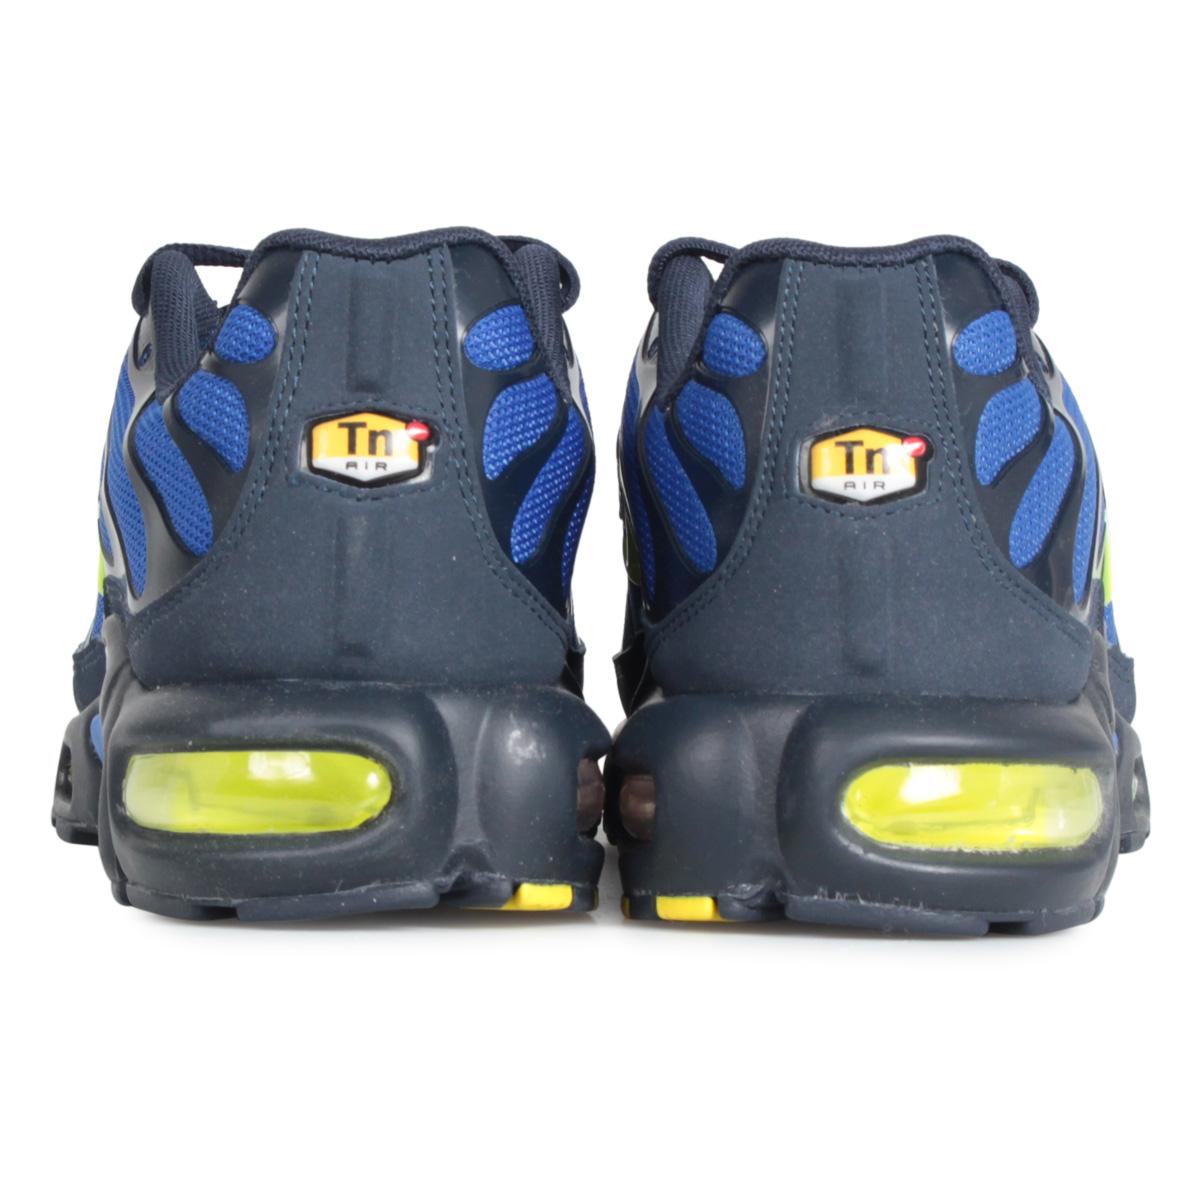 NIKE Kie Ney AMAX plus sneakers men AIR MAX PLUS blue 852,630 412 [1128 Shinnyu load]